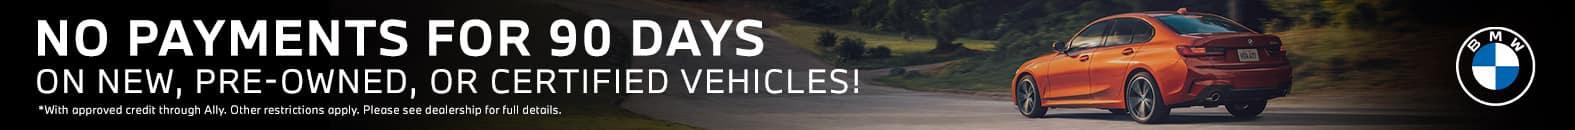 No Payments For 90 Days - Bert Ogden BMW in McAllen, Texas